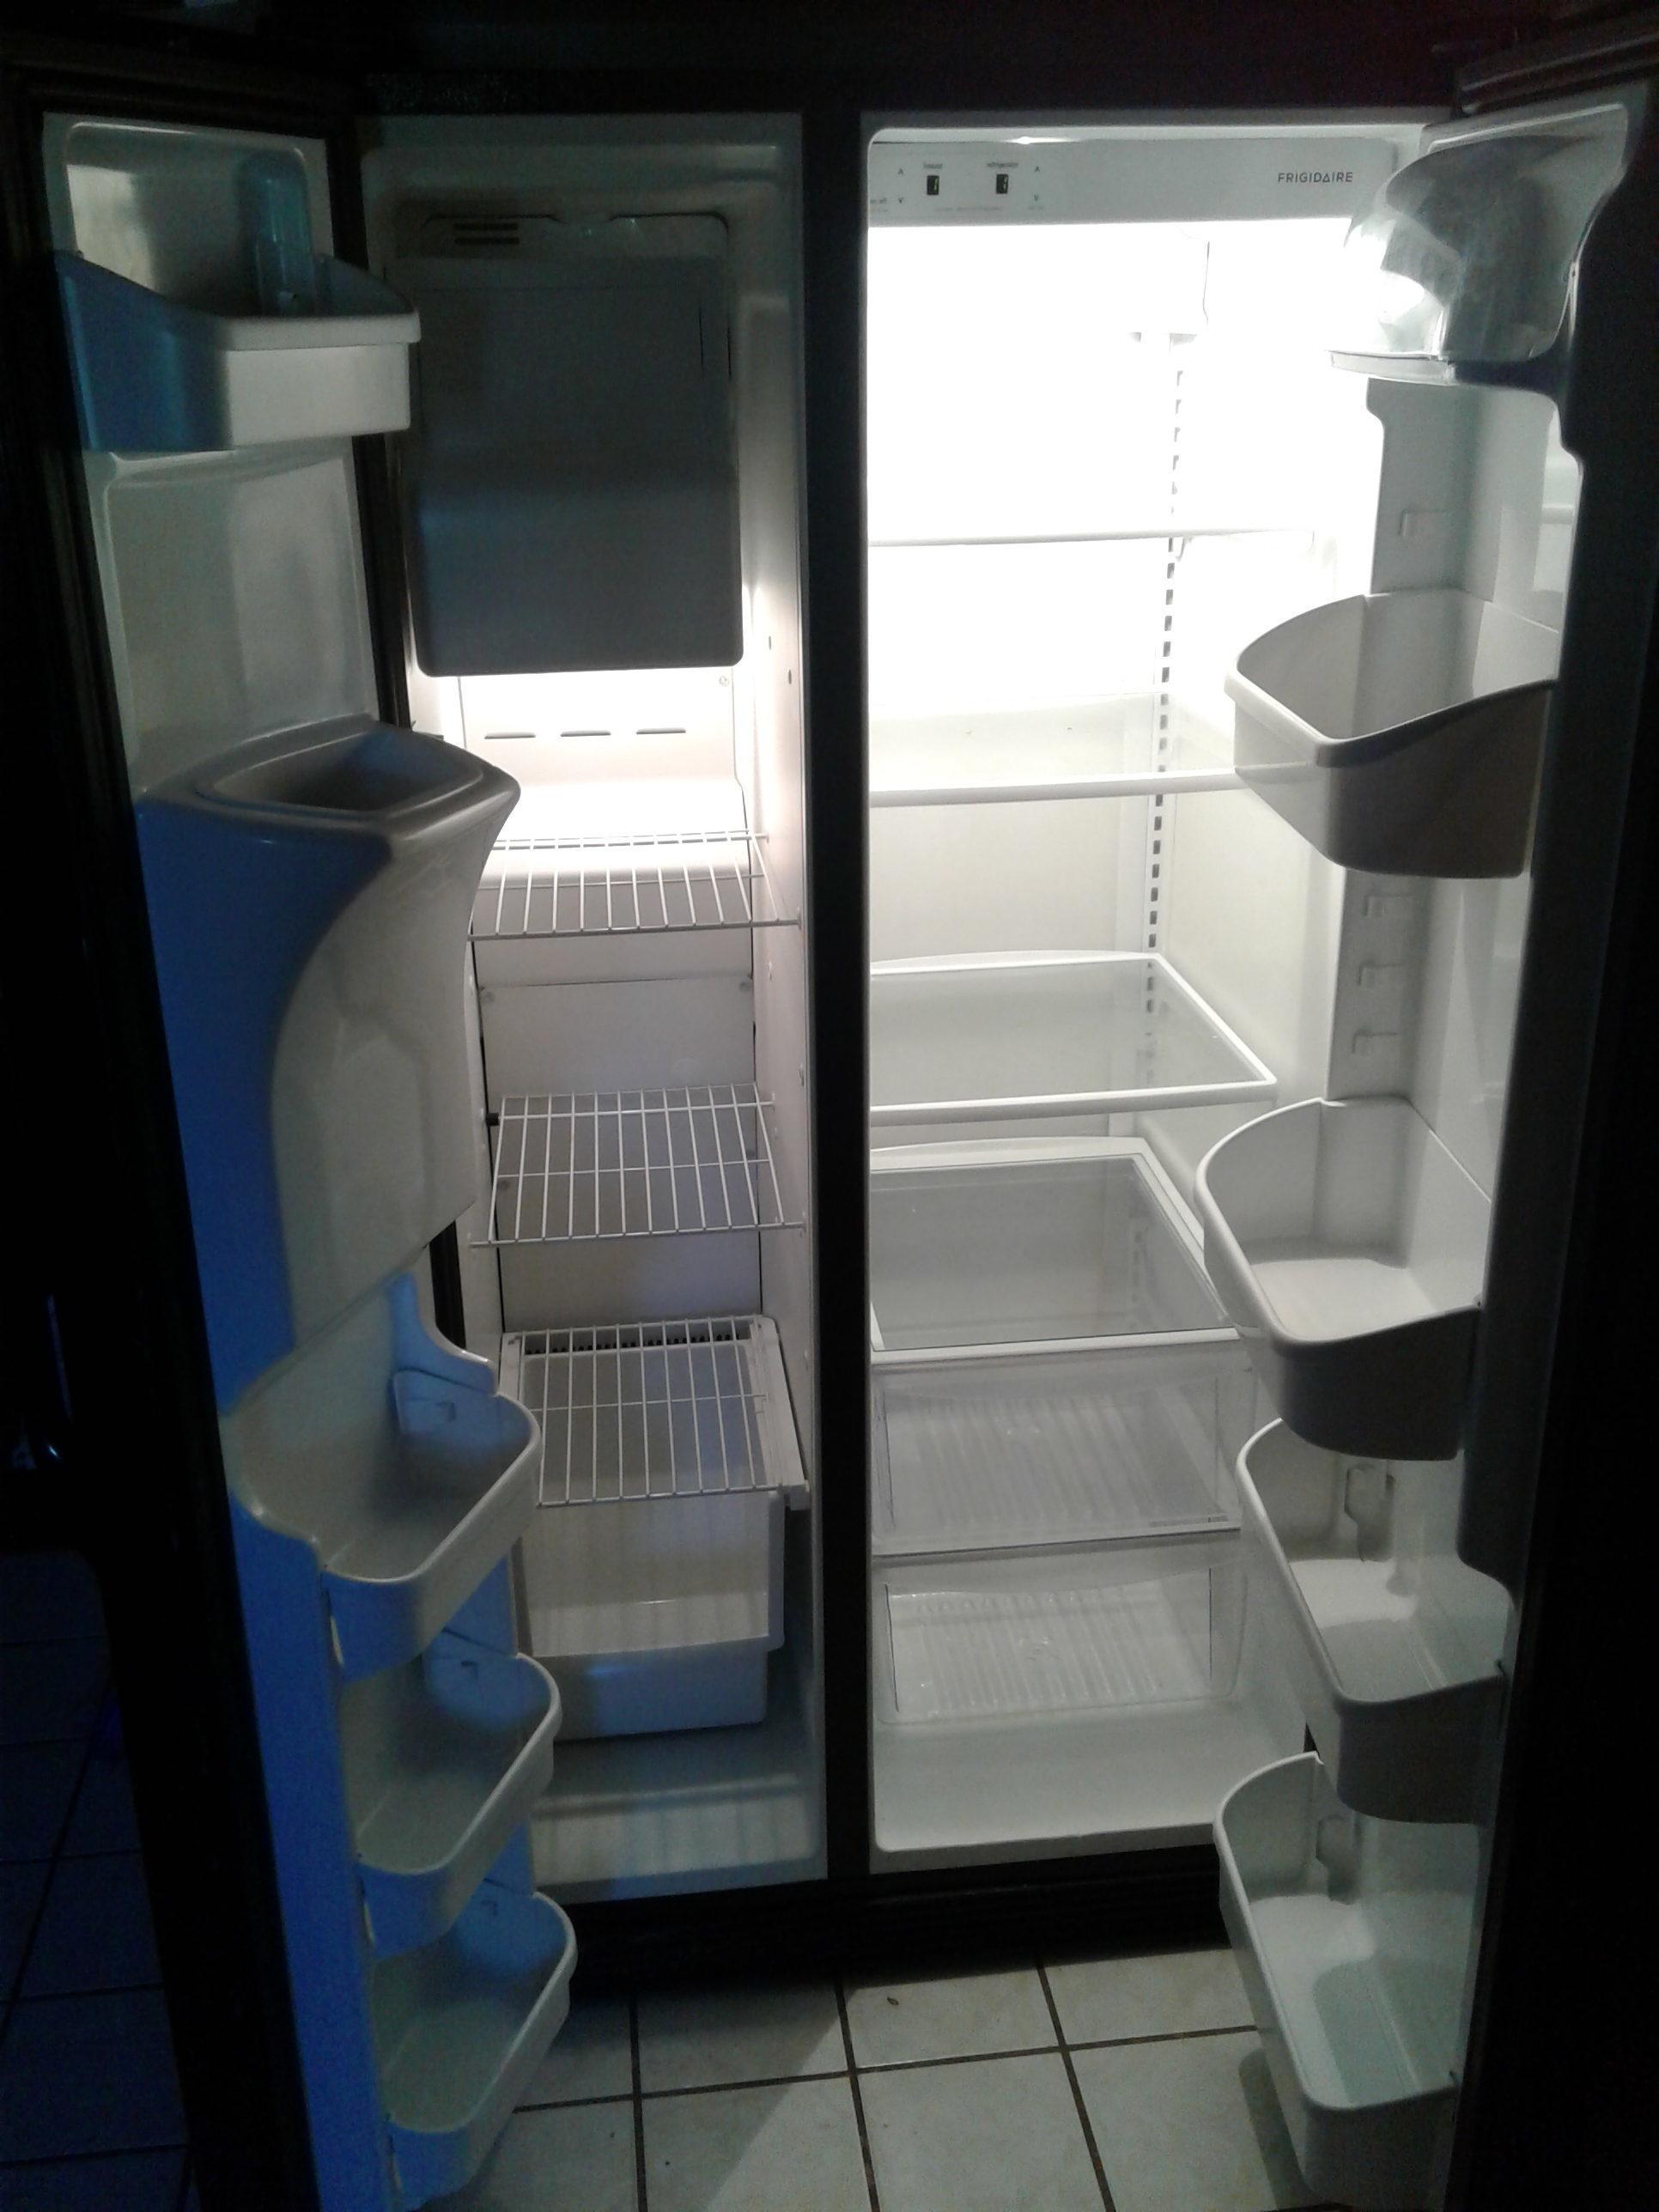 top 781 complaints and reviews about frigidaire refrigerators. Black Bedroom Furniture Sets. Home Design Ideas